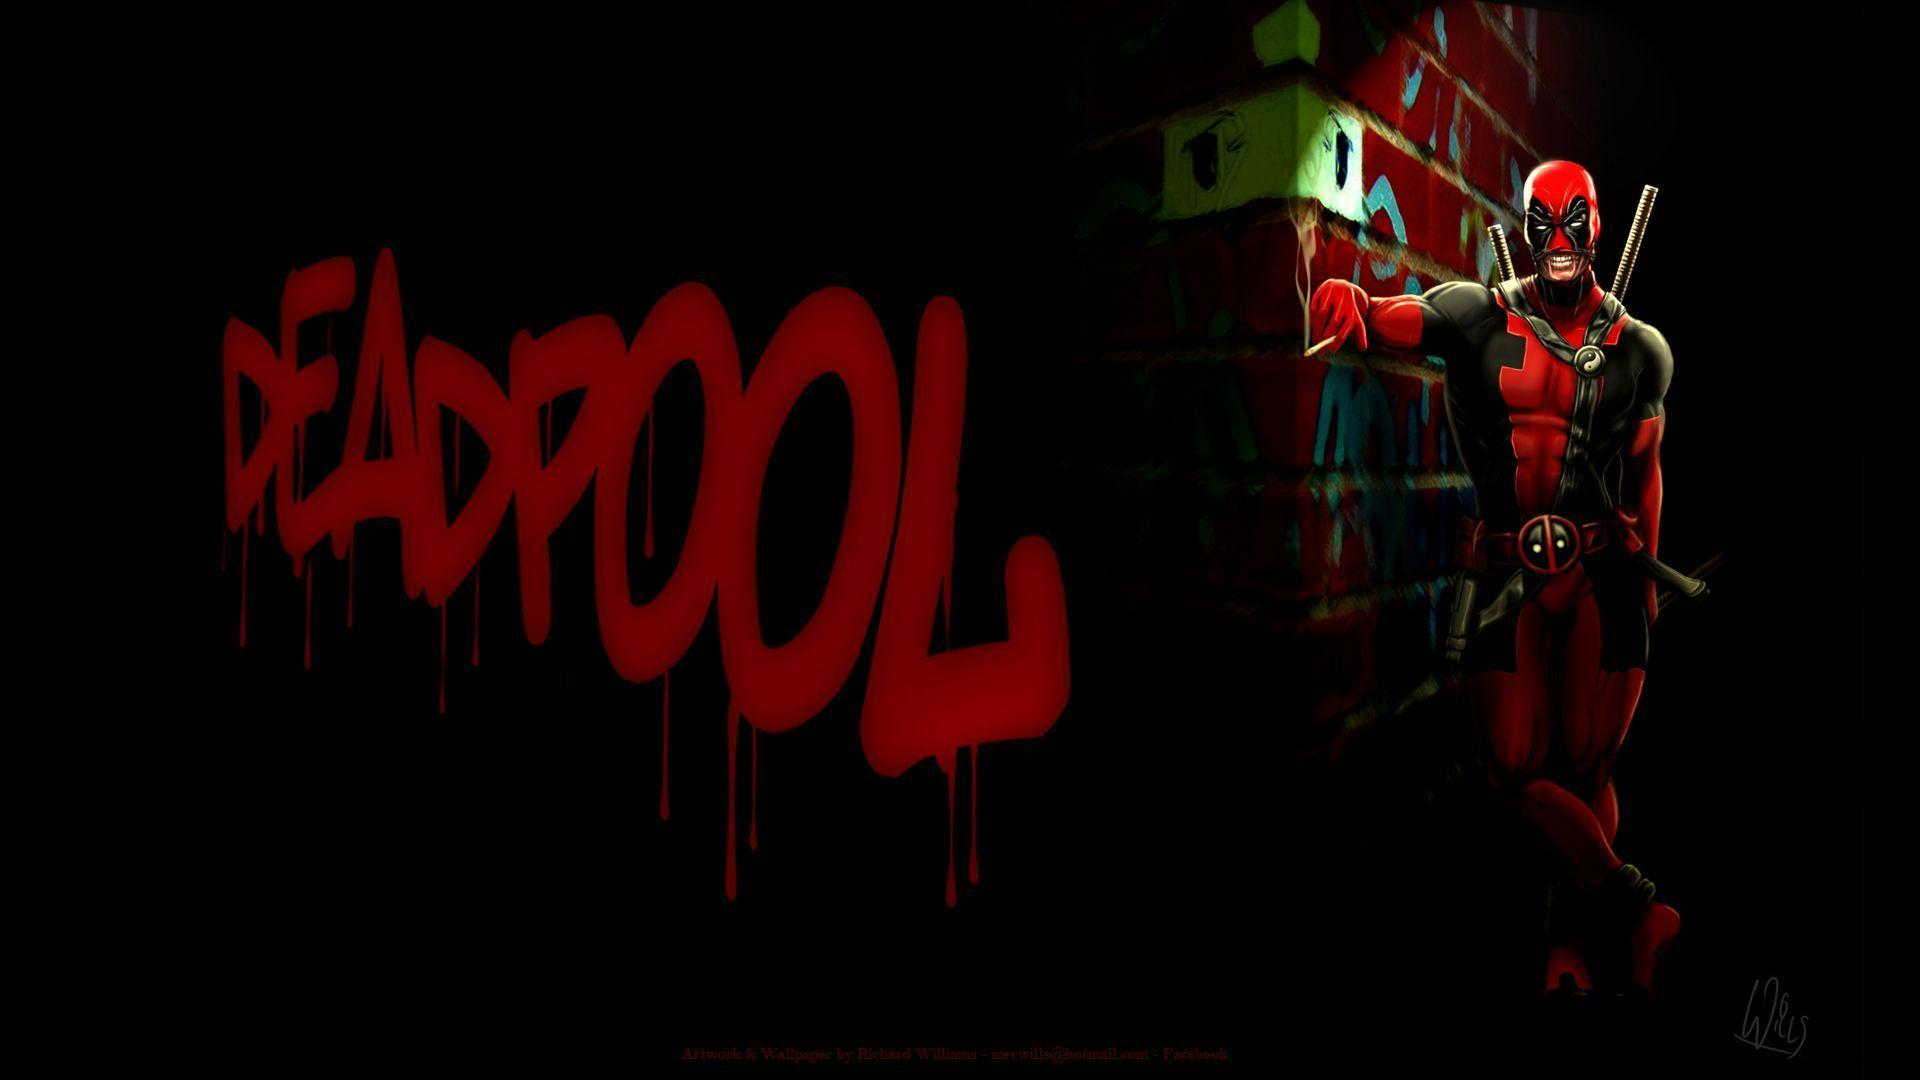 Wallpapers For > Deadpool Wallpaper 1920x1080 Hd